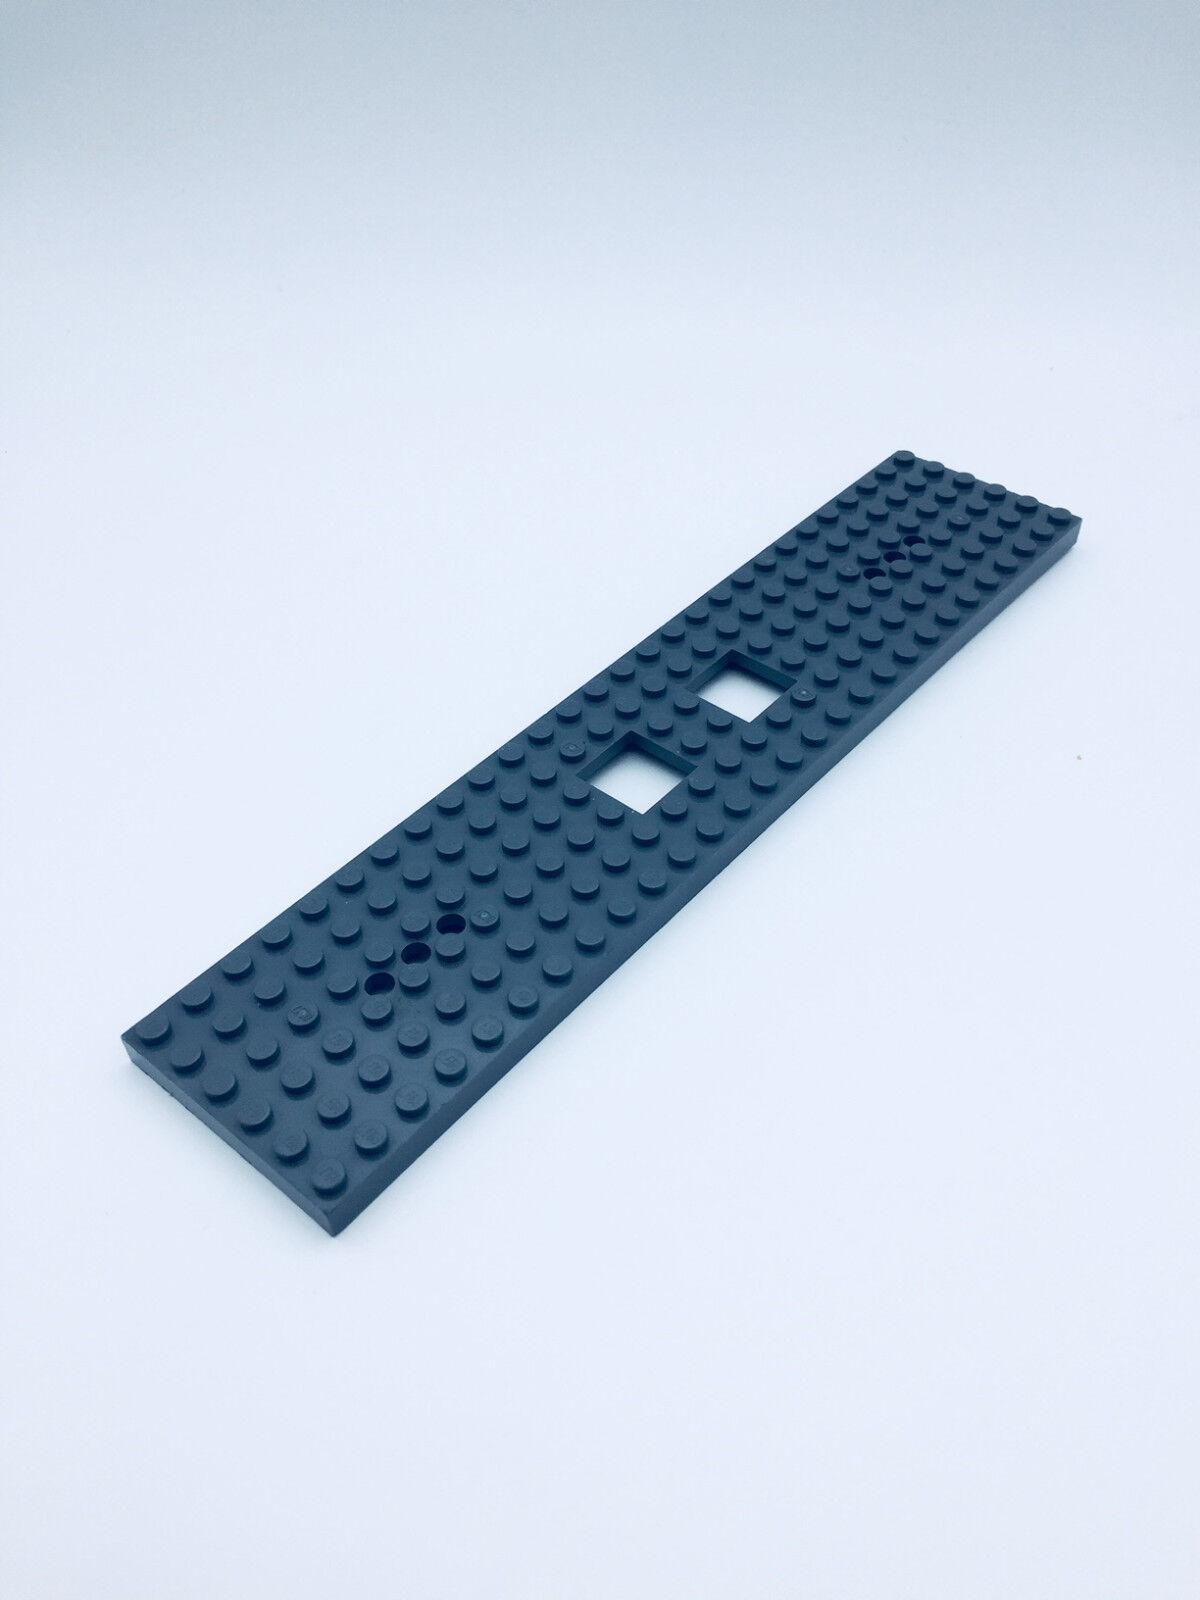 Lego Eisenbahn TRAIN Waggon Grundplatte Platte 6x24 DUNKELGRAU PLATE